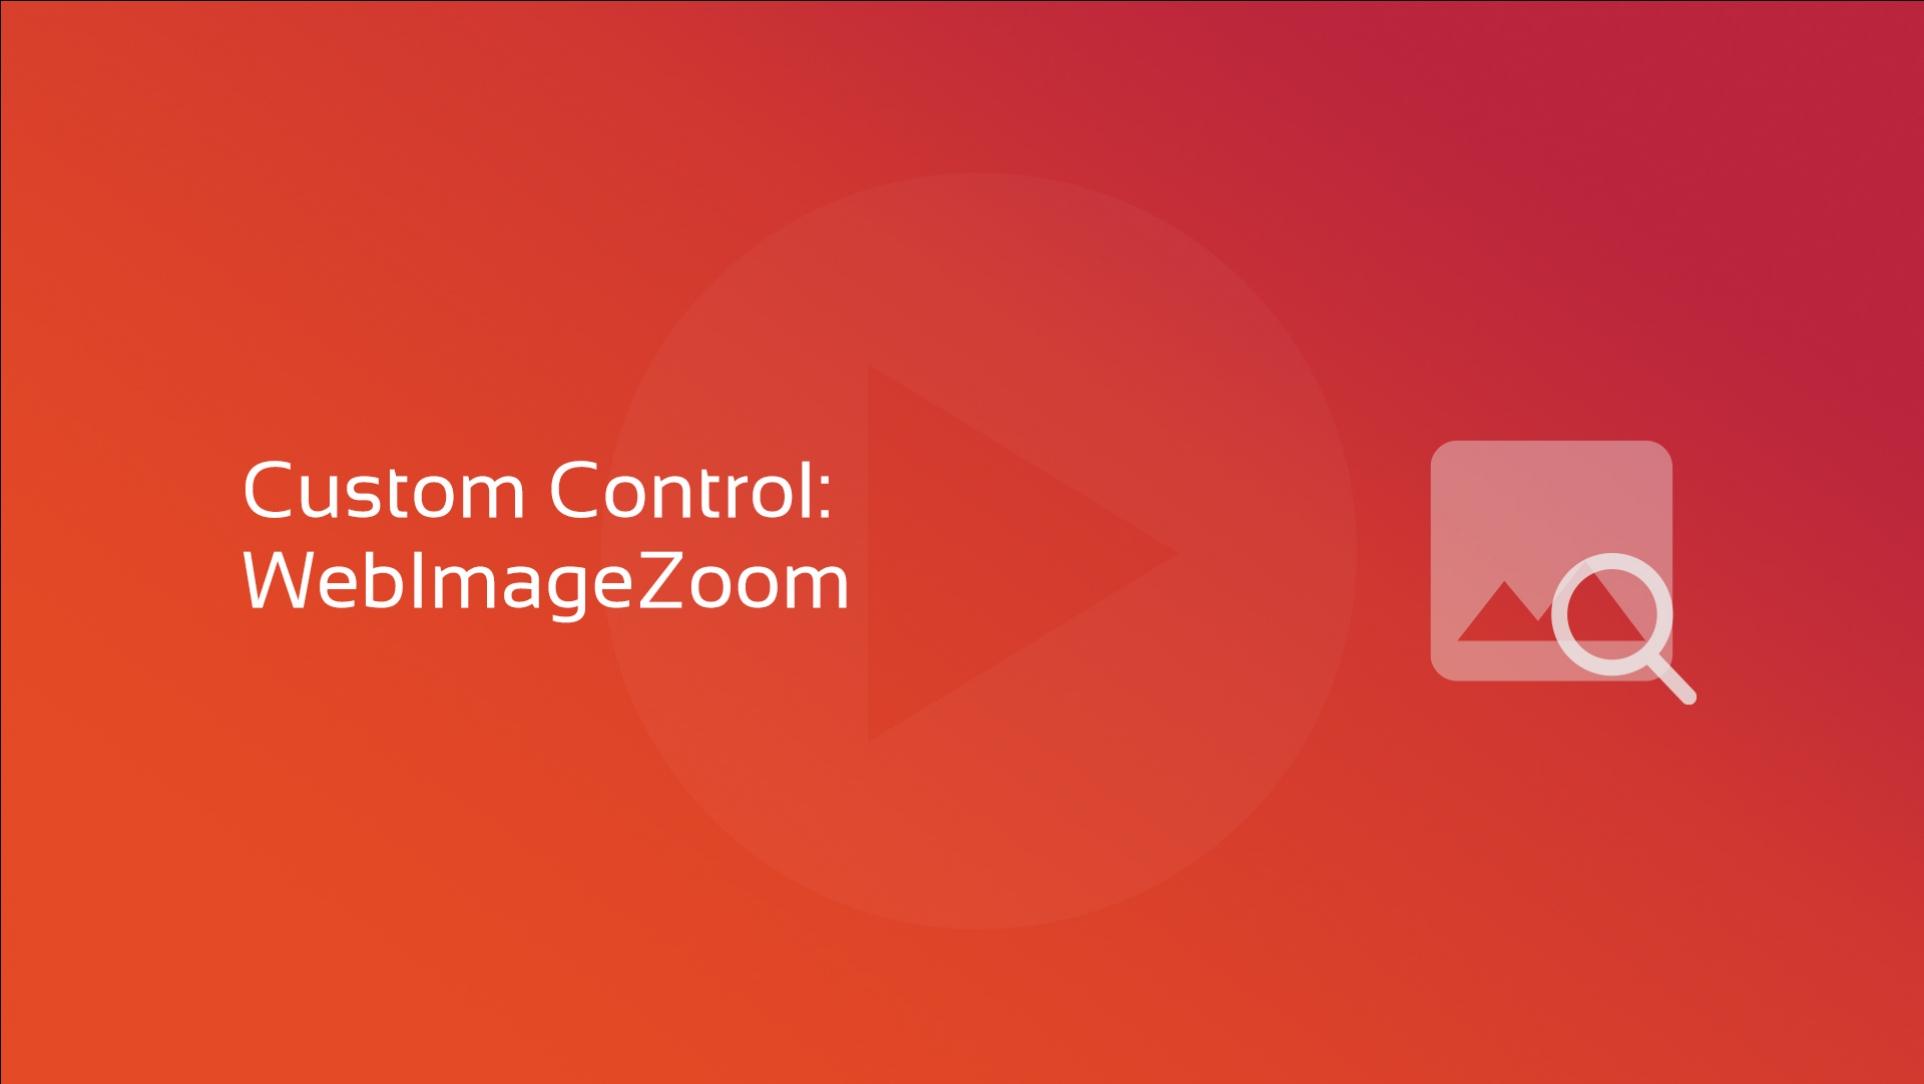 2020-02-24 Custom Control WebImageZoom OG